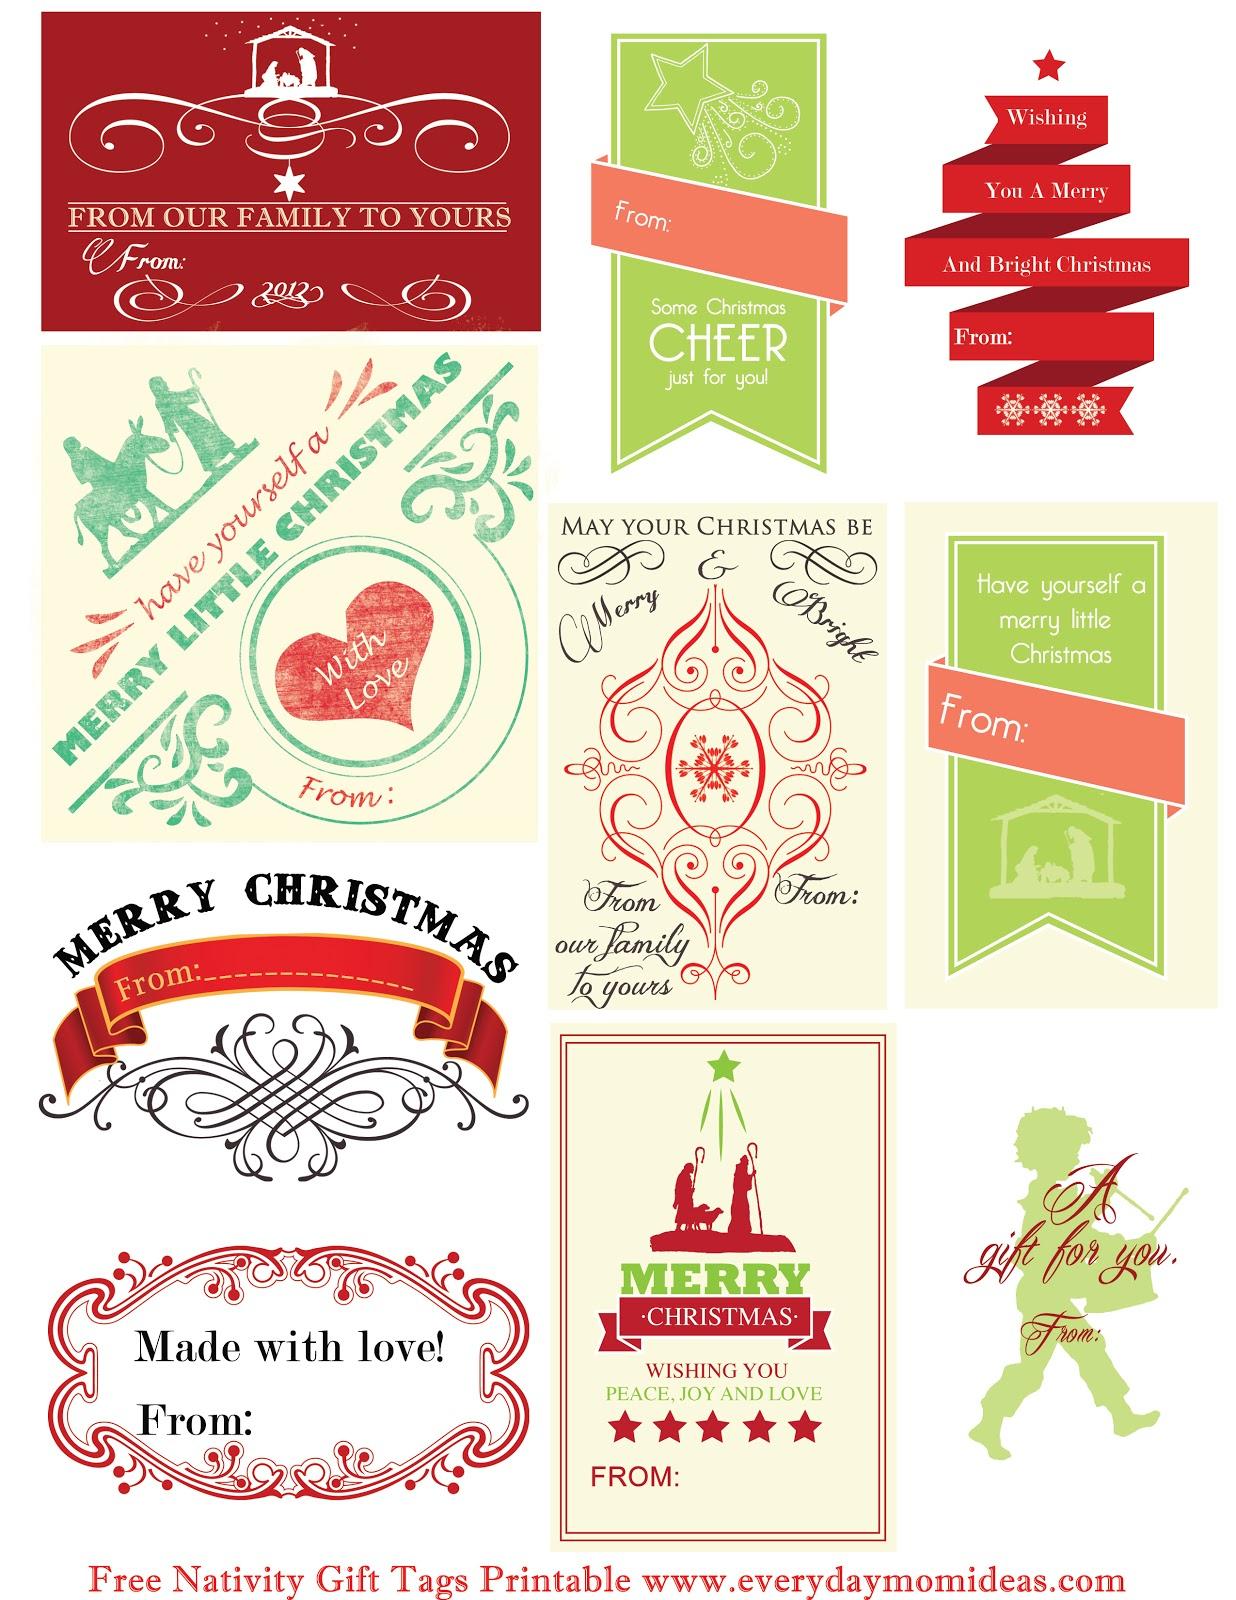 Free Nativity Gift Tags Printable - Everyday Mom Ideas - Free Printable Toe Tags